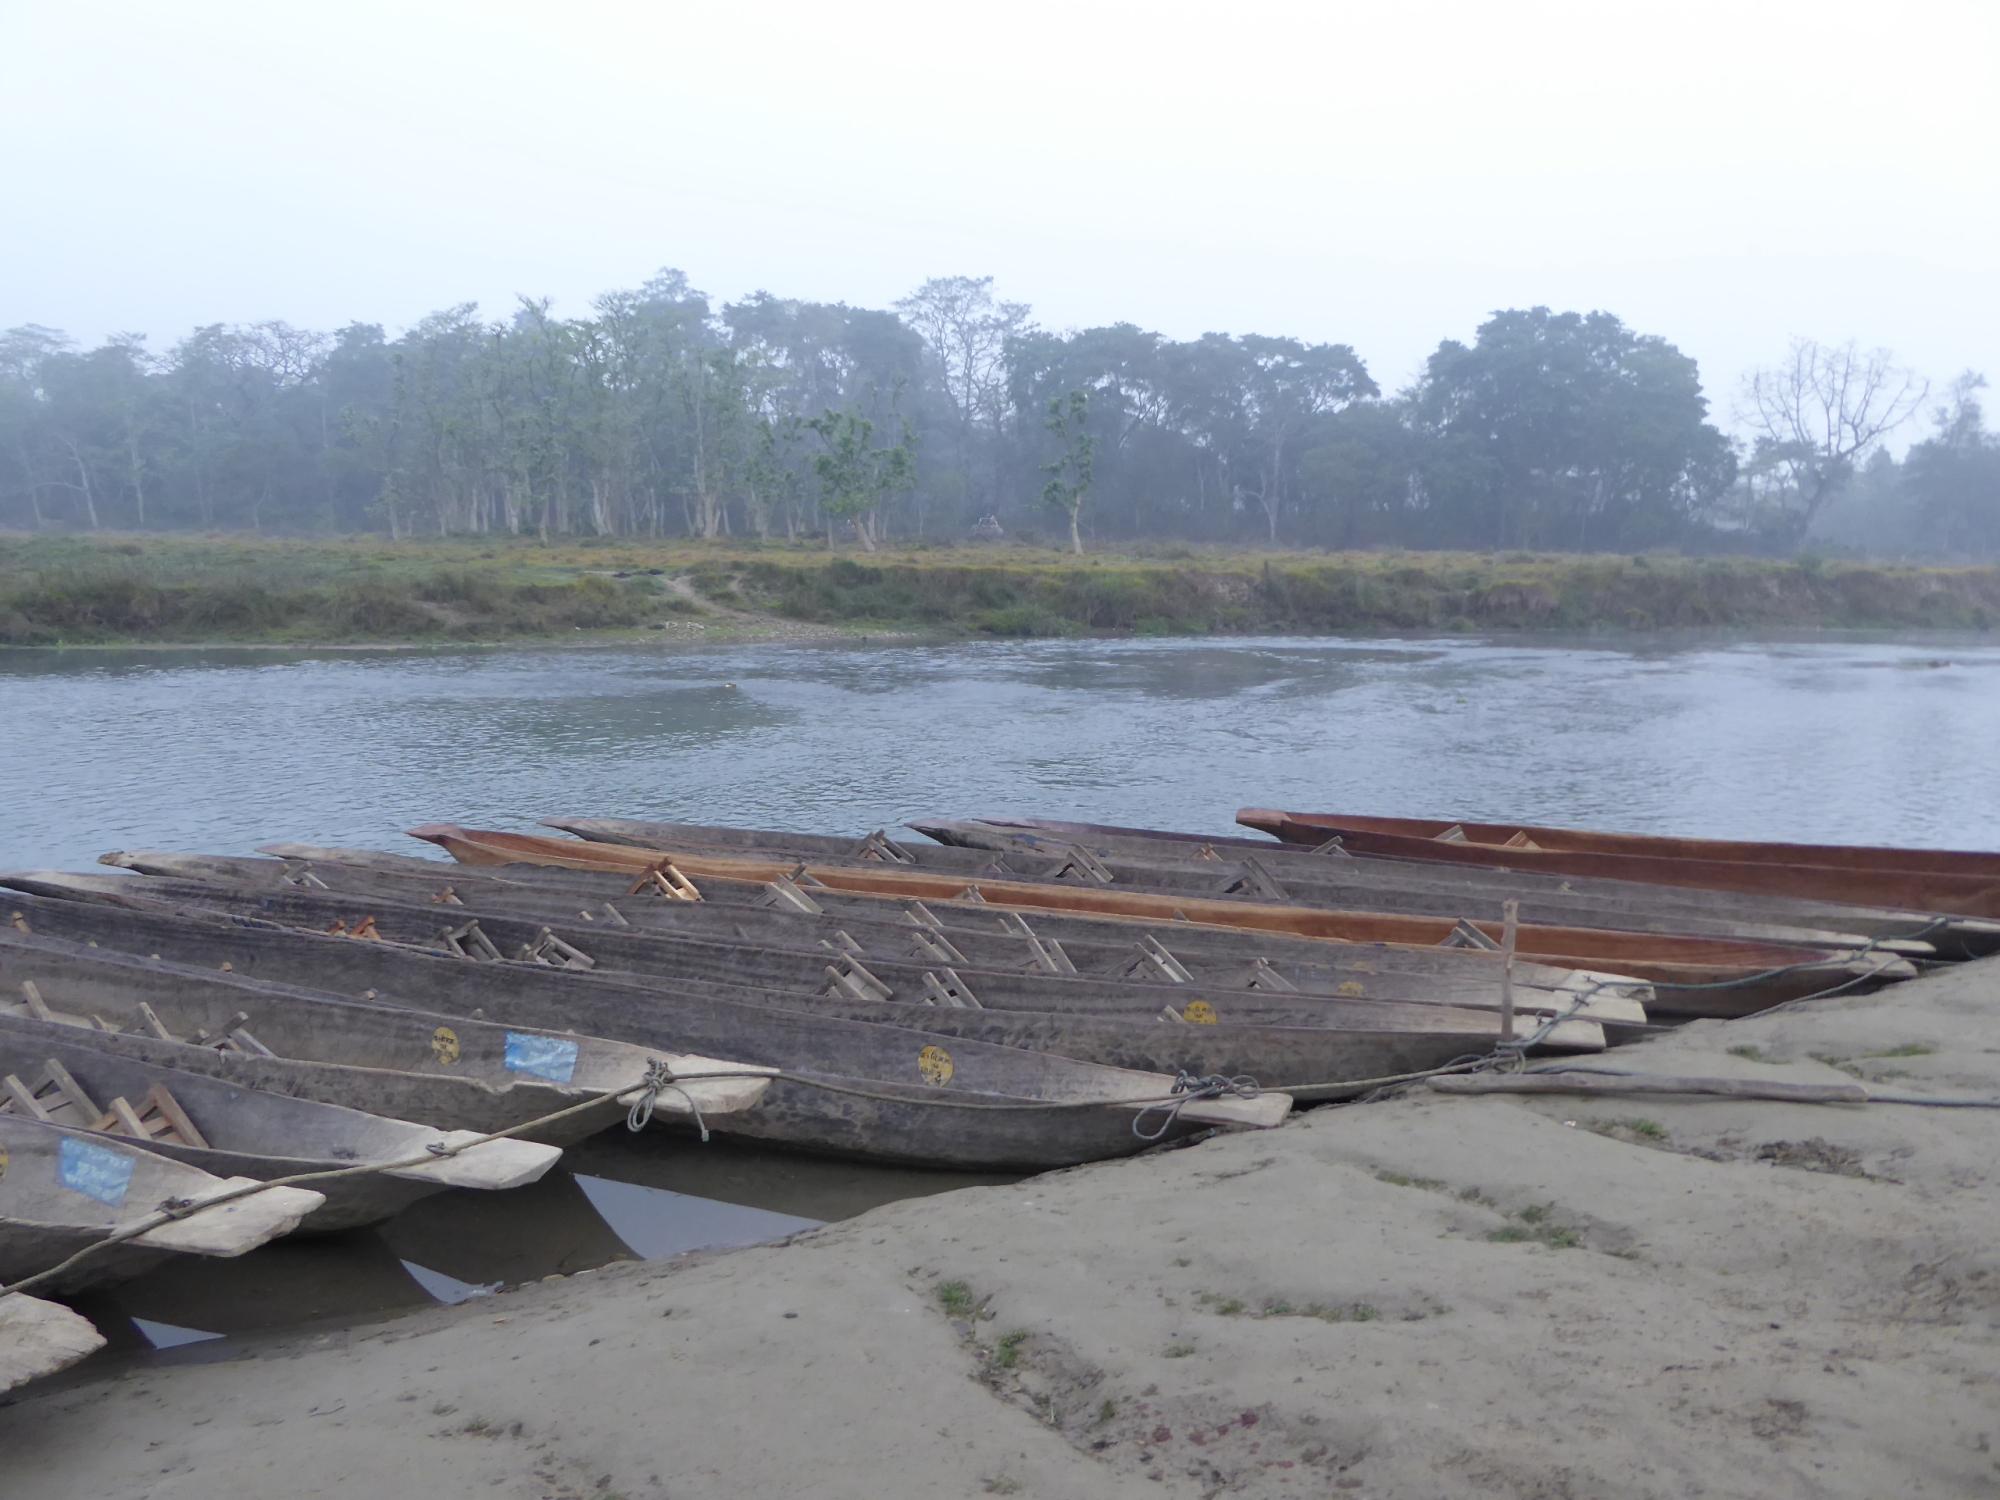 Crocodiles in Dugout Canoes in Chitwan, Nepal – Team Strawberry